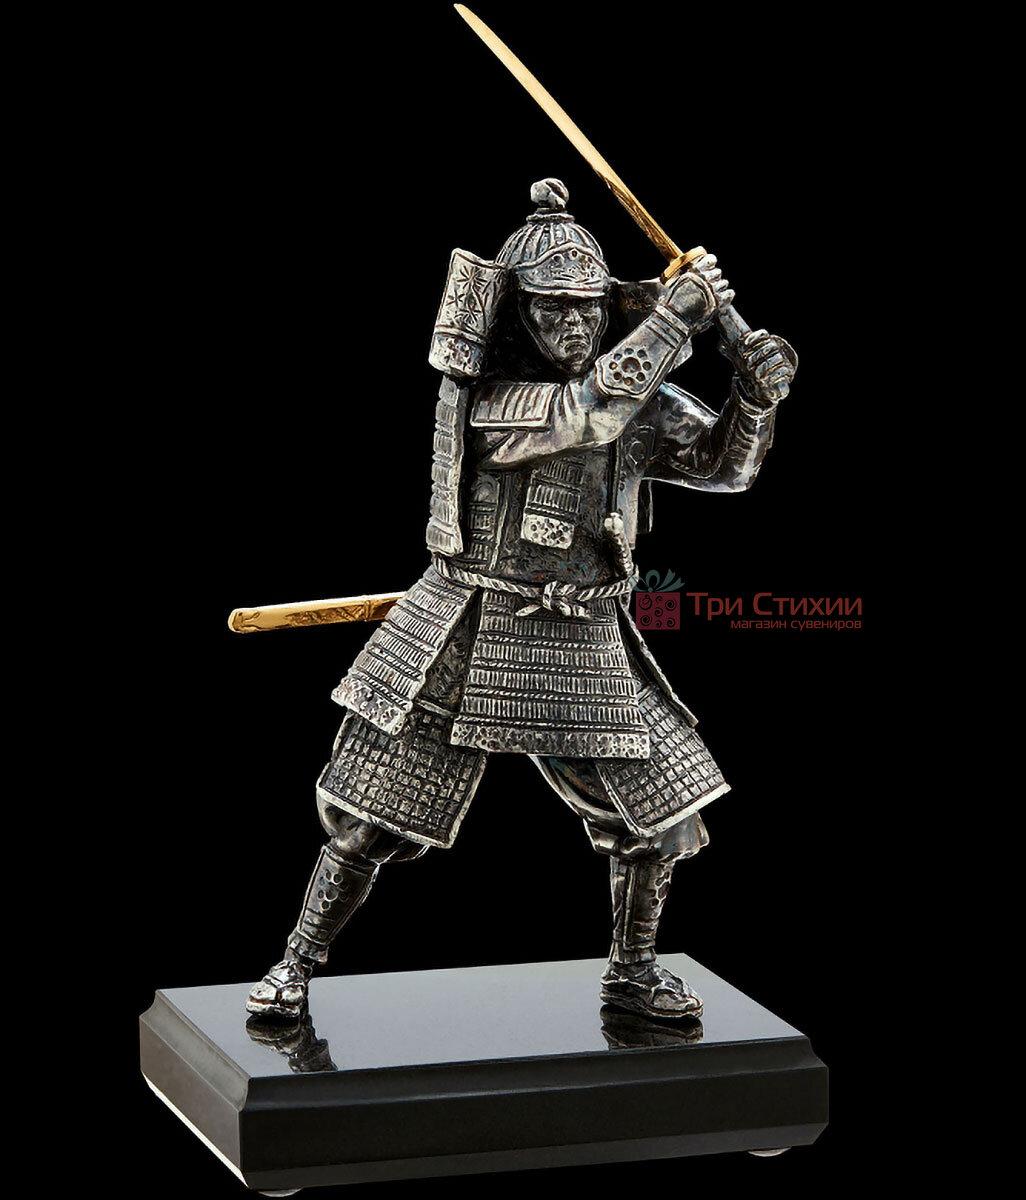 Статуэтка из бронзы «Самурай» с мечом Vizuri (Визури) W01, фото 3